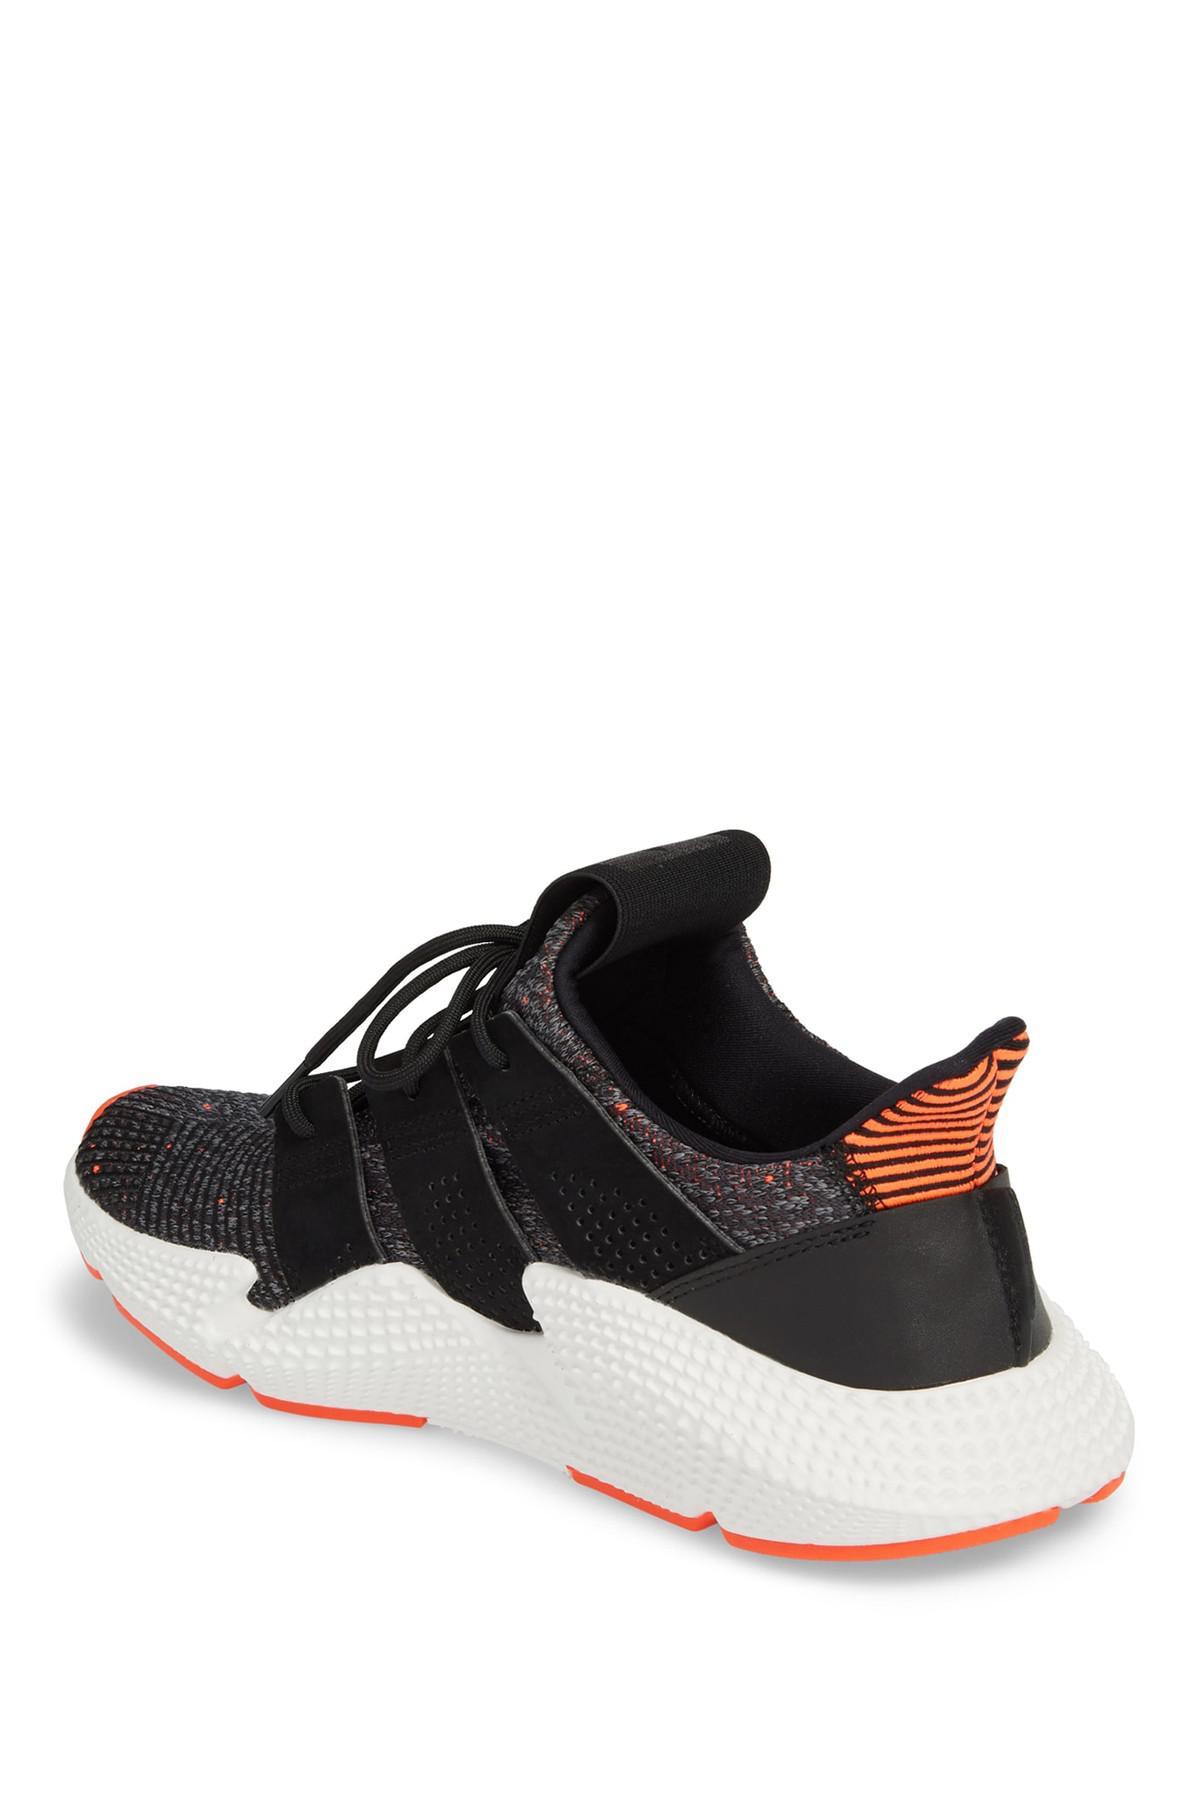 size 40 bb5b6 ac16d Adidas - Black Prophere Sneaker for Men - Lyst. View fullscreen